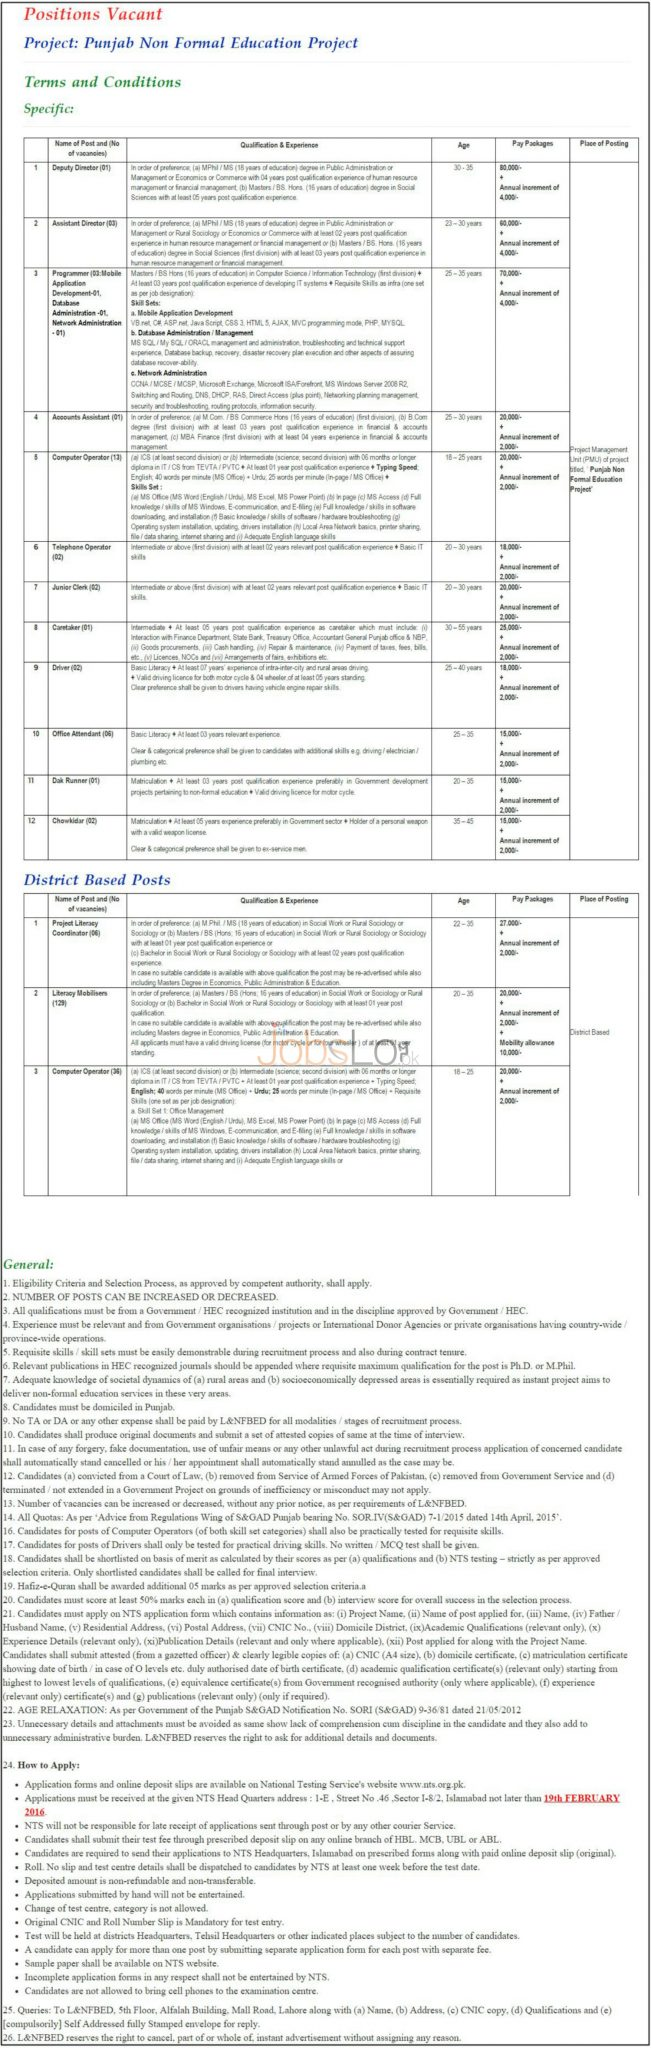 www.literacy.gop.pk Jobs Application Form 2016 NTS Latest Advertisement